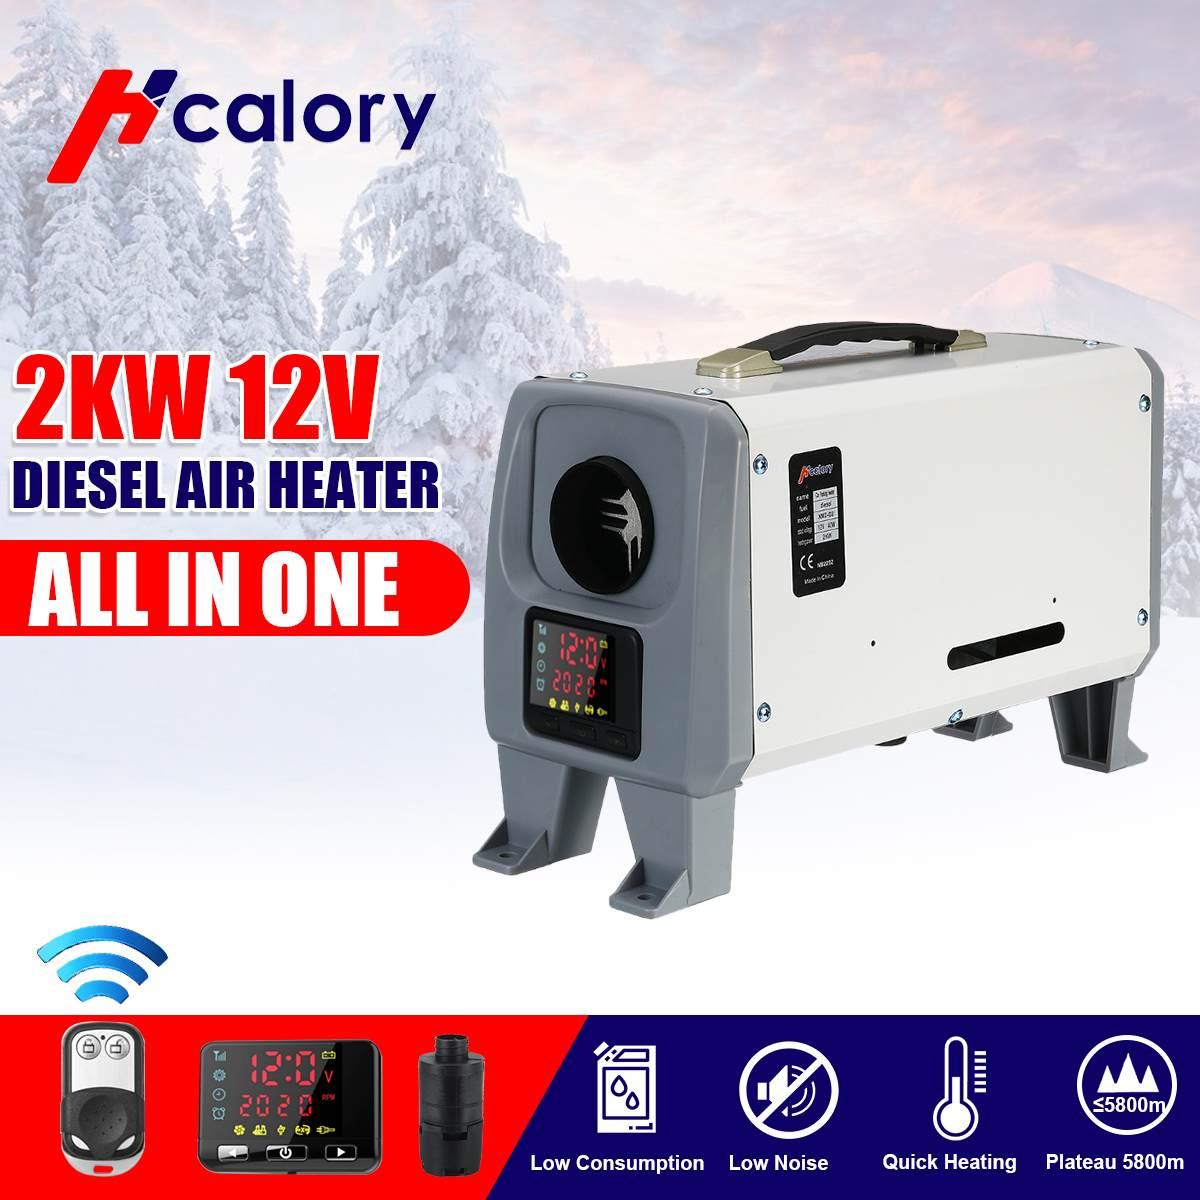 12V 2KW Car Heating Tool Diesel Air Heater Single Hole LCD Monitor Parking Warmer For Car Bus Boat RV,motorhome,truck Trailer